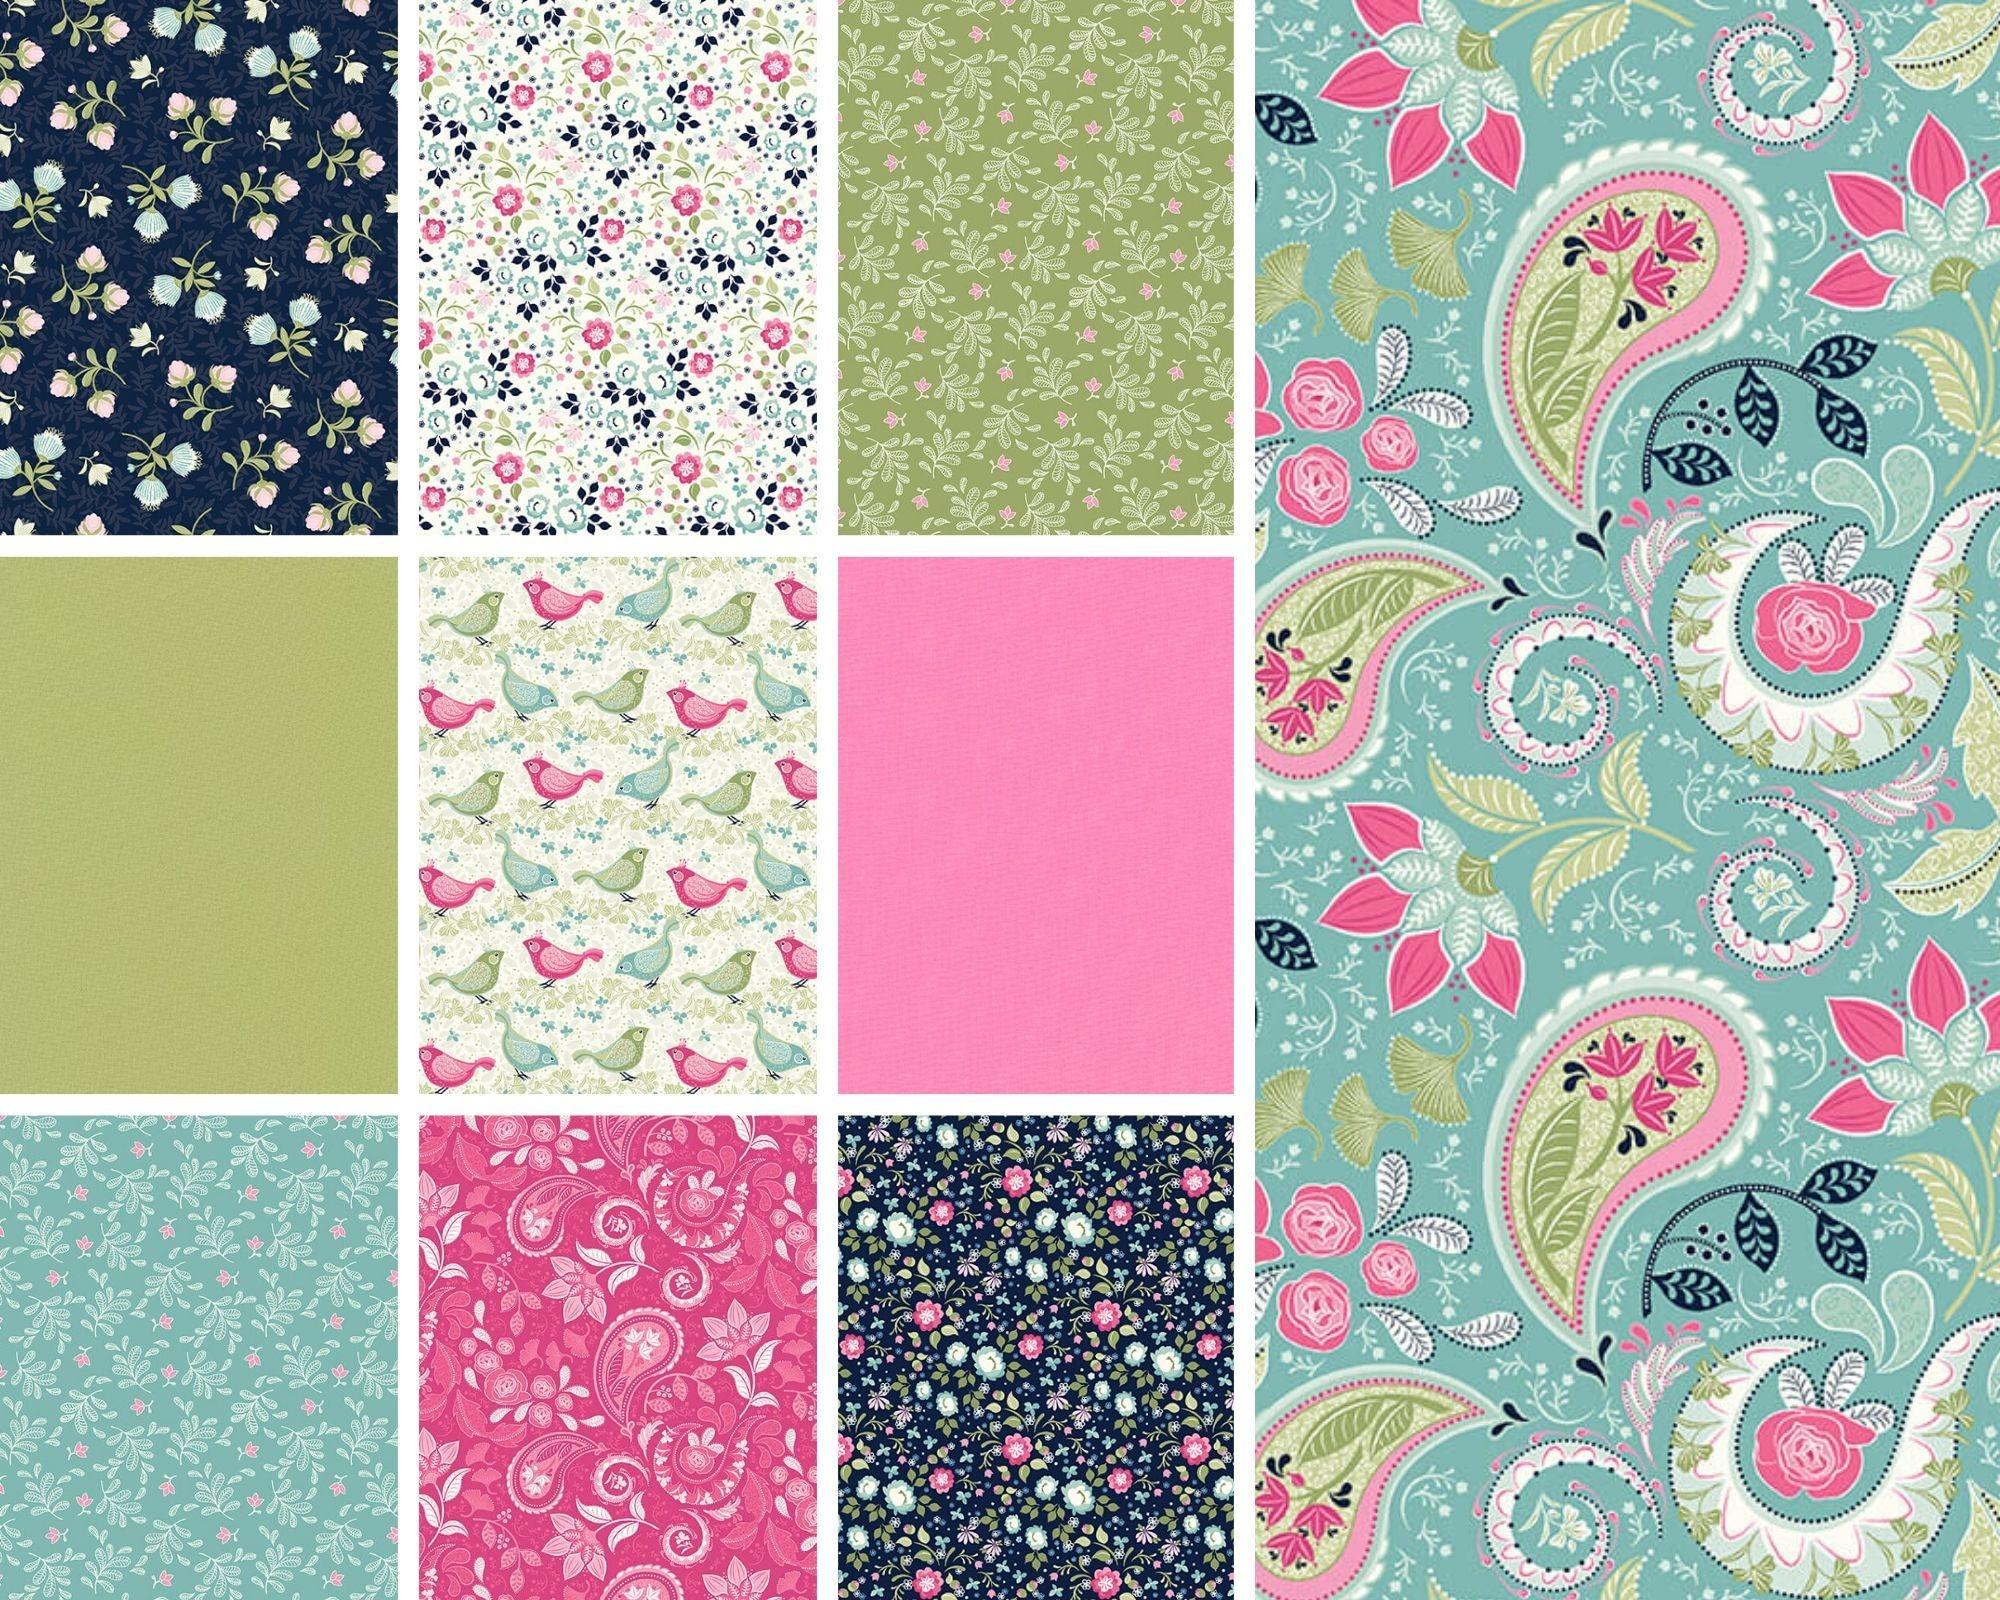 STUDIO E Boho Blooms, Florals 10x fat quarter collection